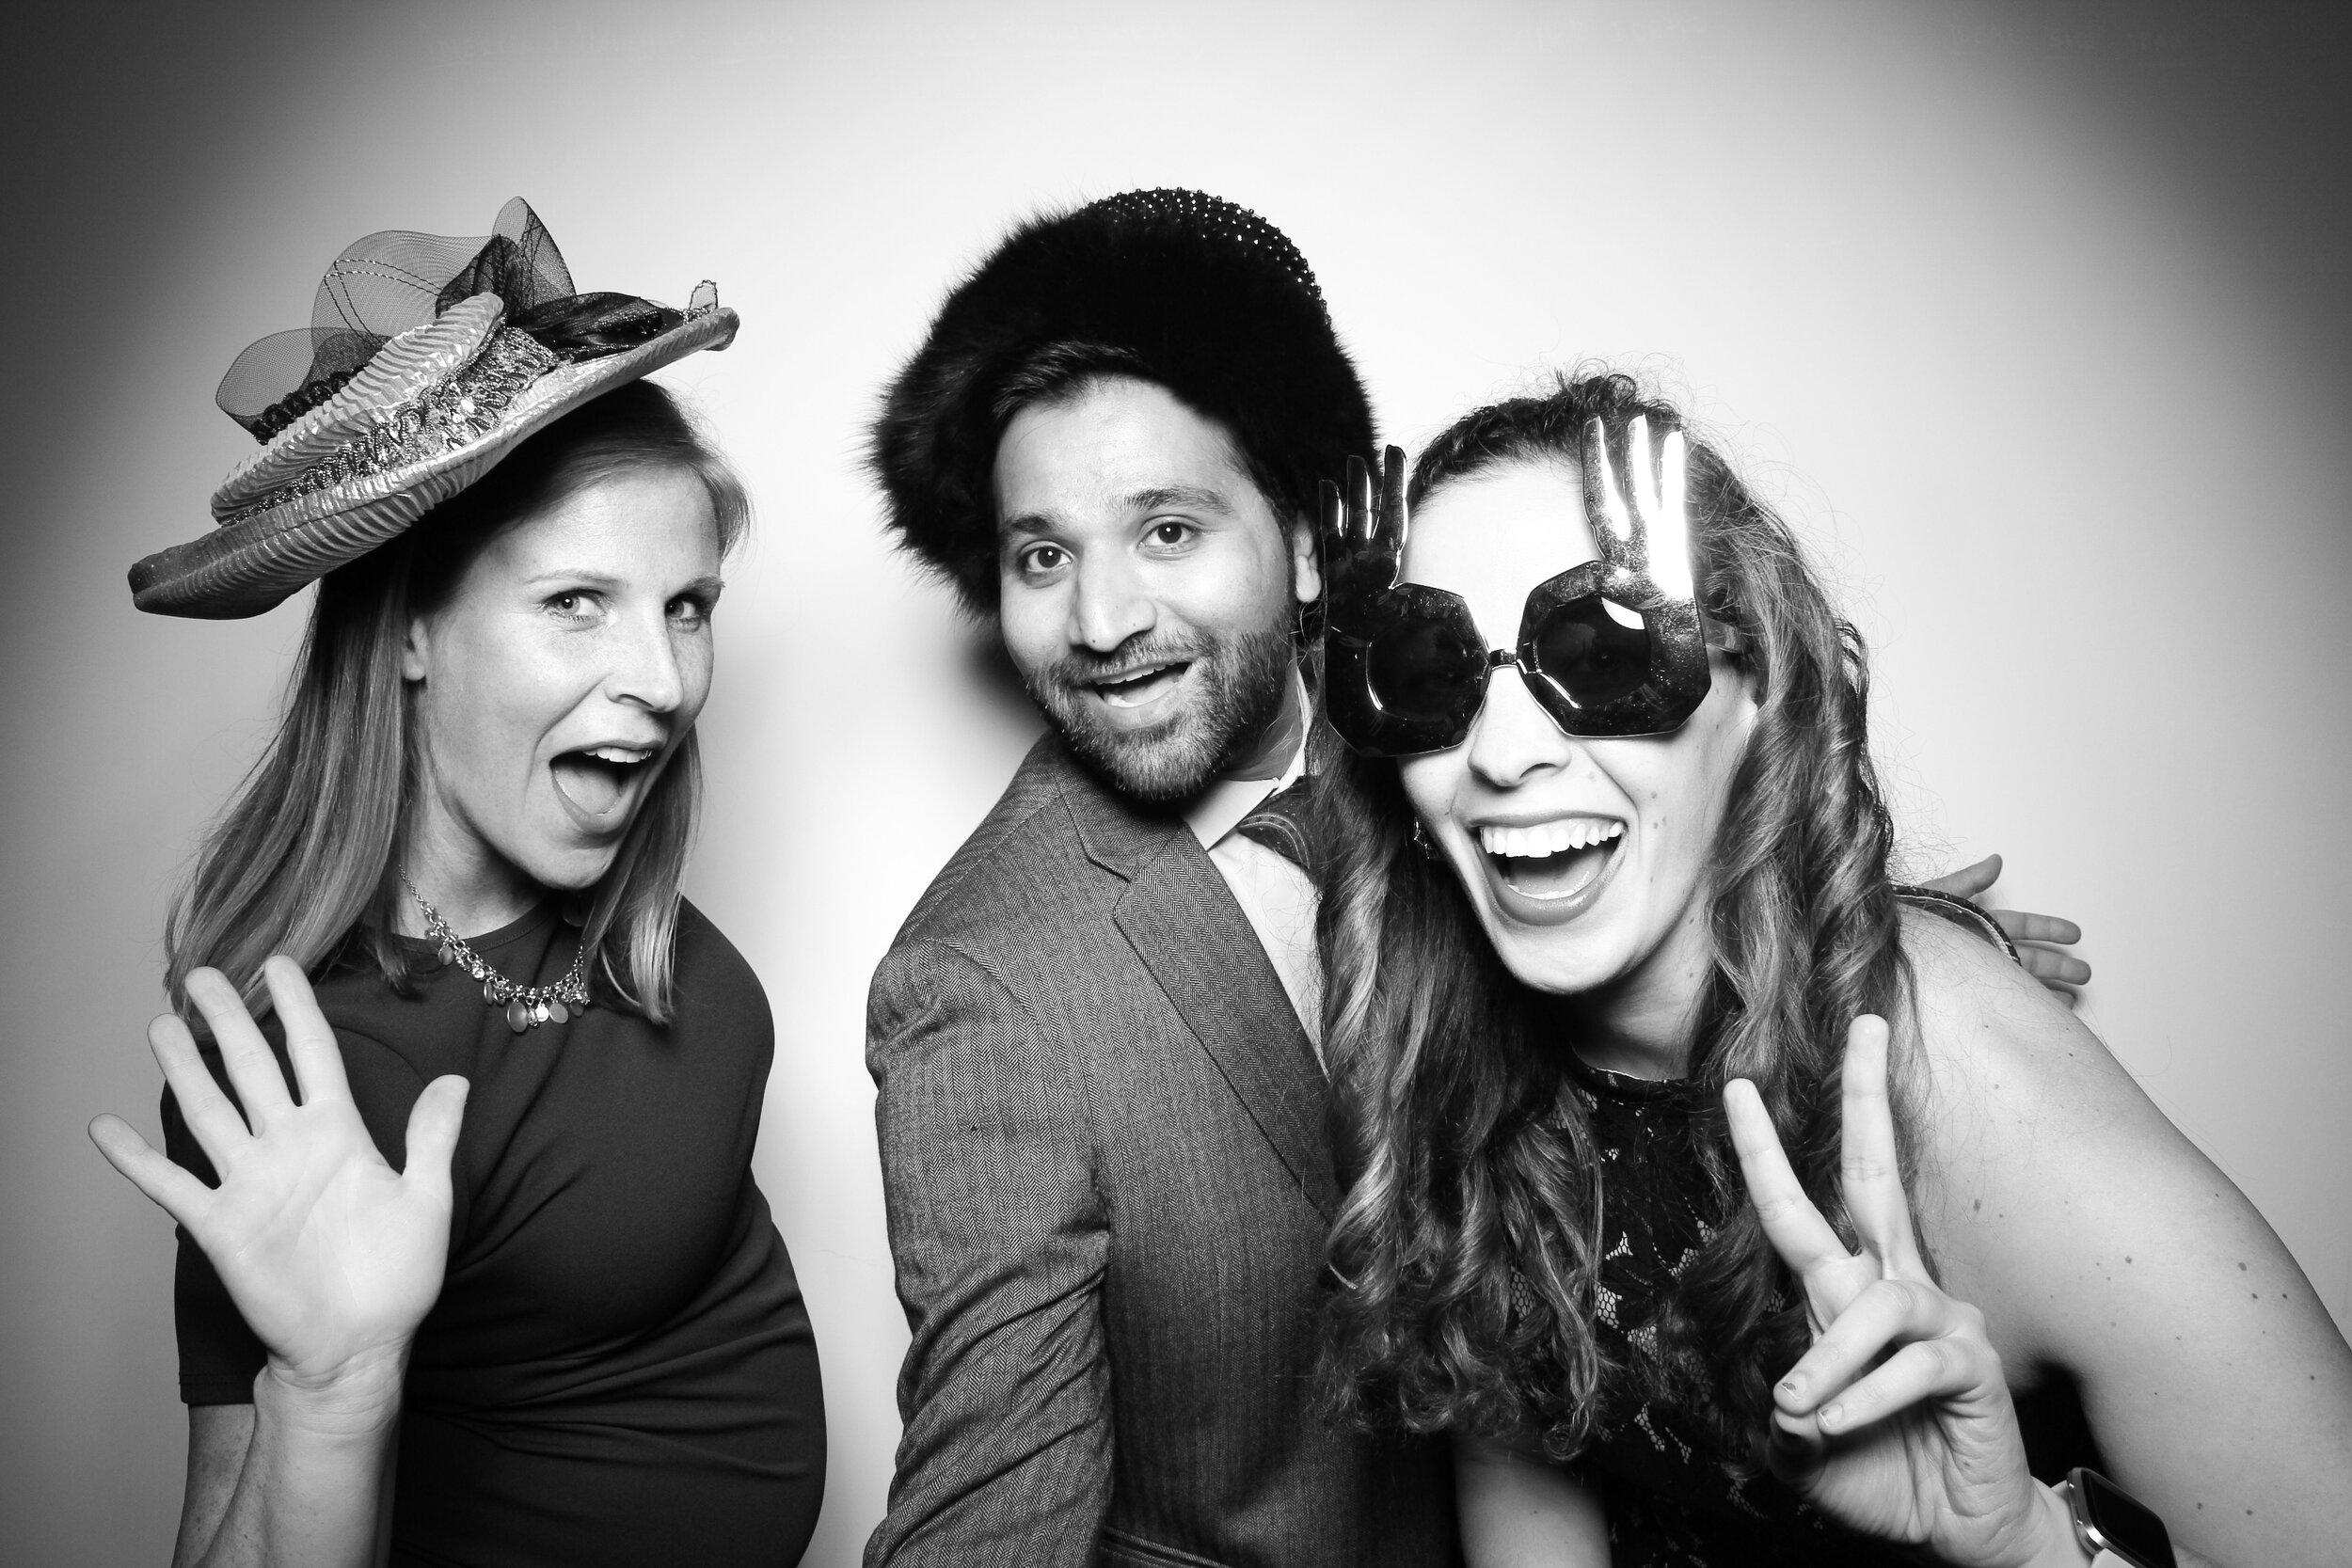 Chicago_Vintage_Wedding_Photobooth_Amerigo_Company_Party_02.jpg